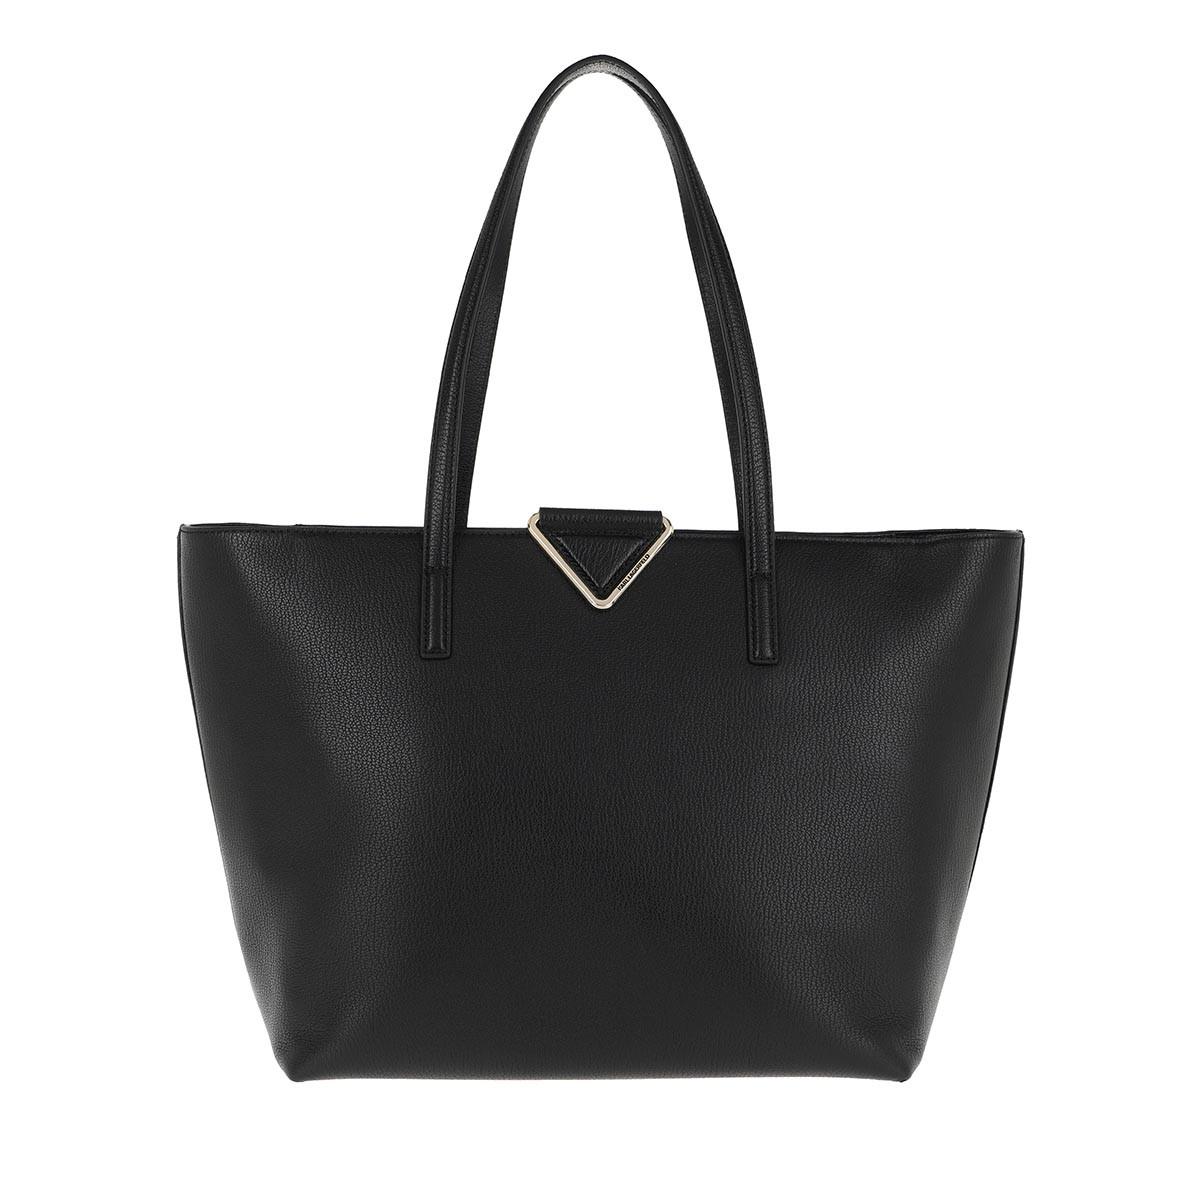 Karl Lagerfeld Shopper - Vektor Tote Black/Gold - in schwarz - für Damen